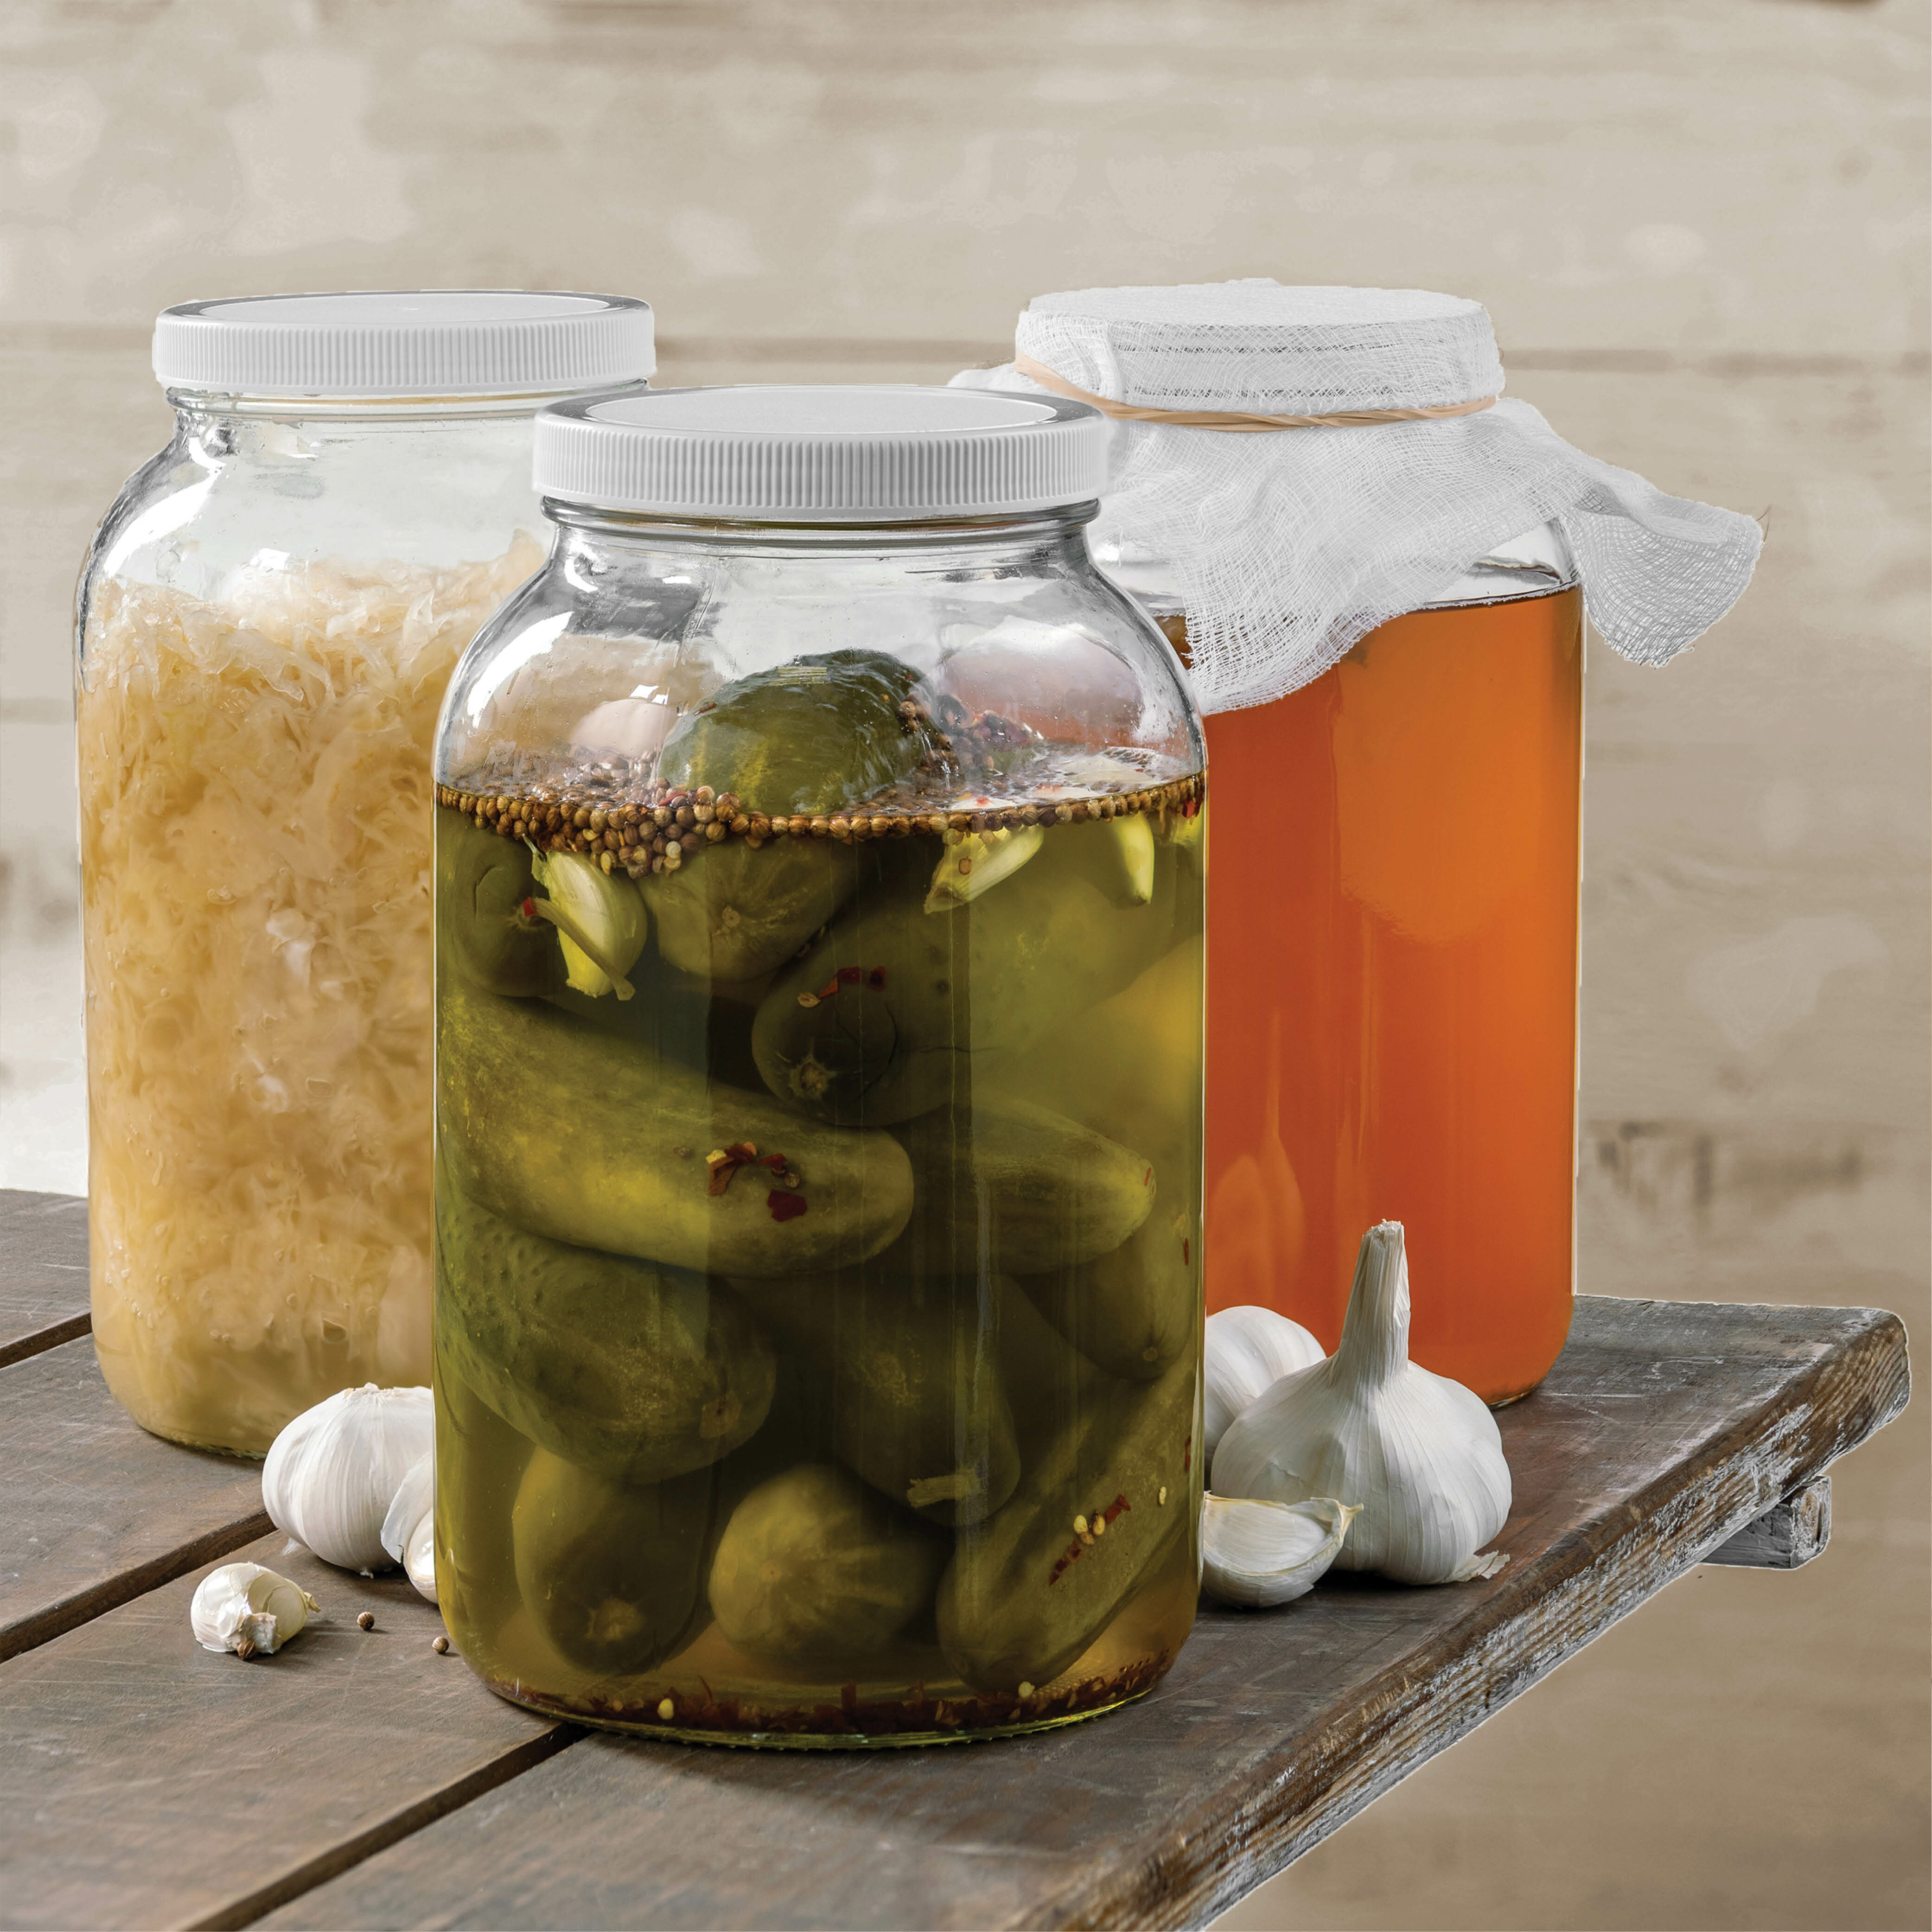 Pakshnovelty Glass Wide Mouth 4 Qt Canning Jar Reviews Wayfair